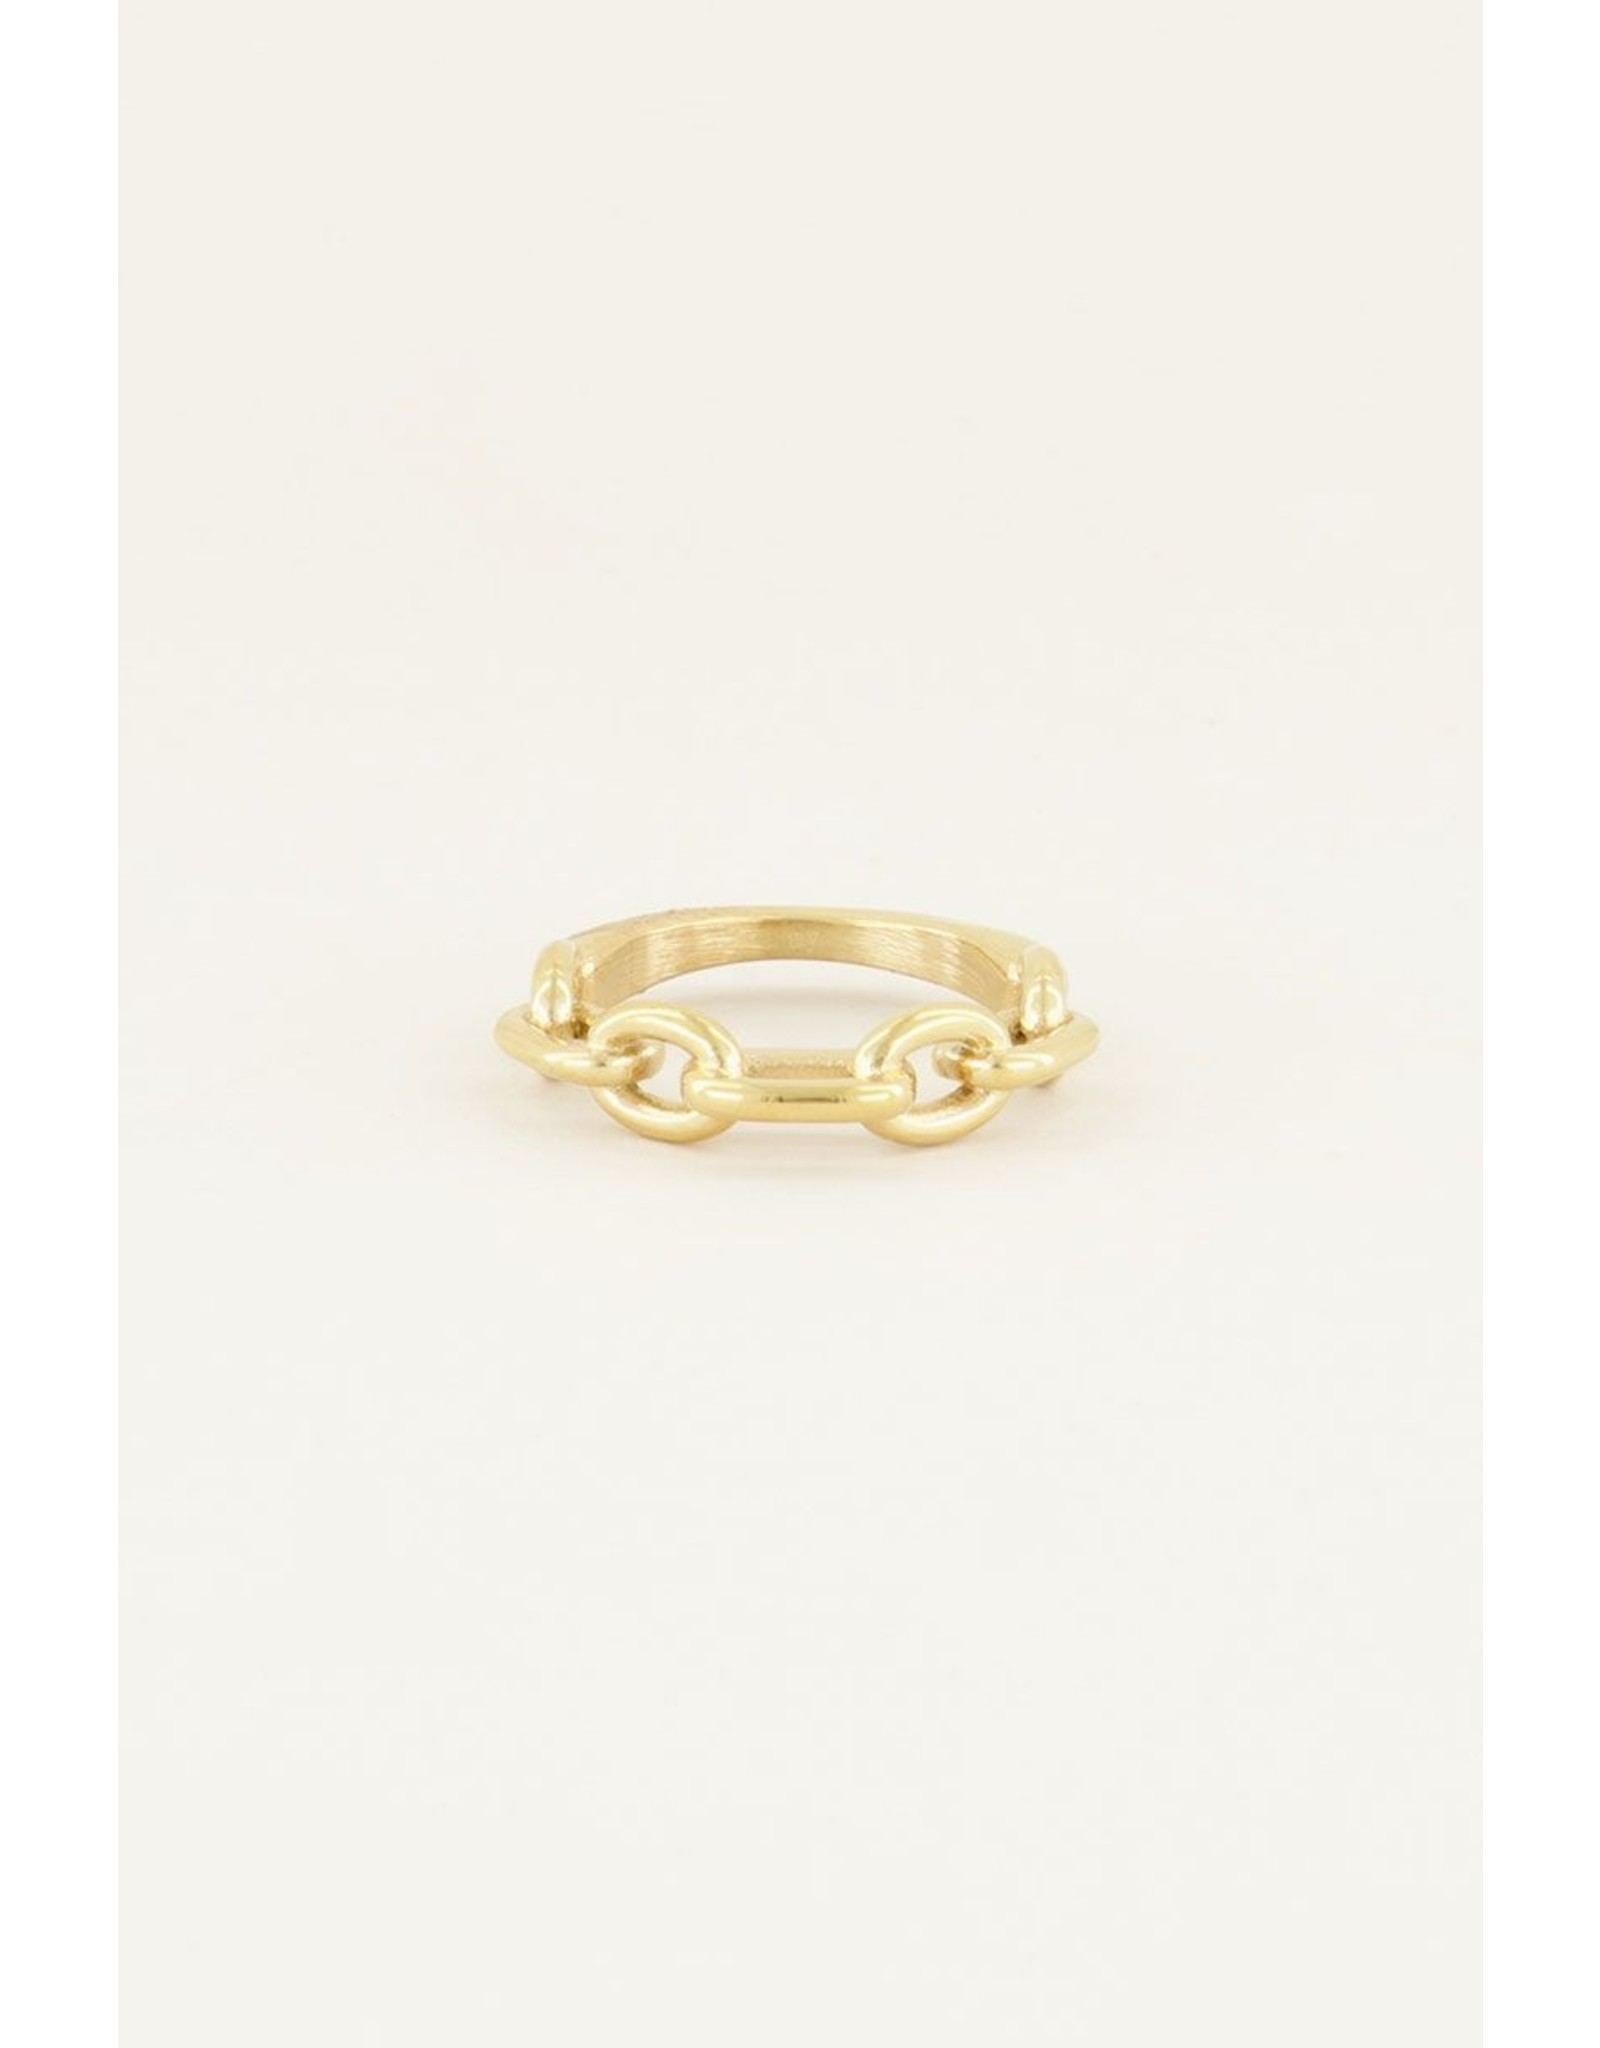 Ring smalle schakel goud